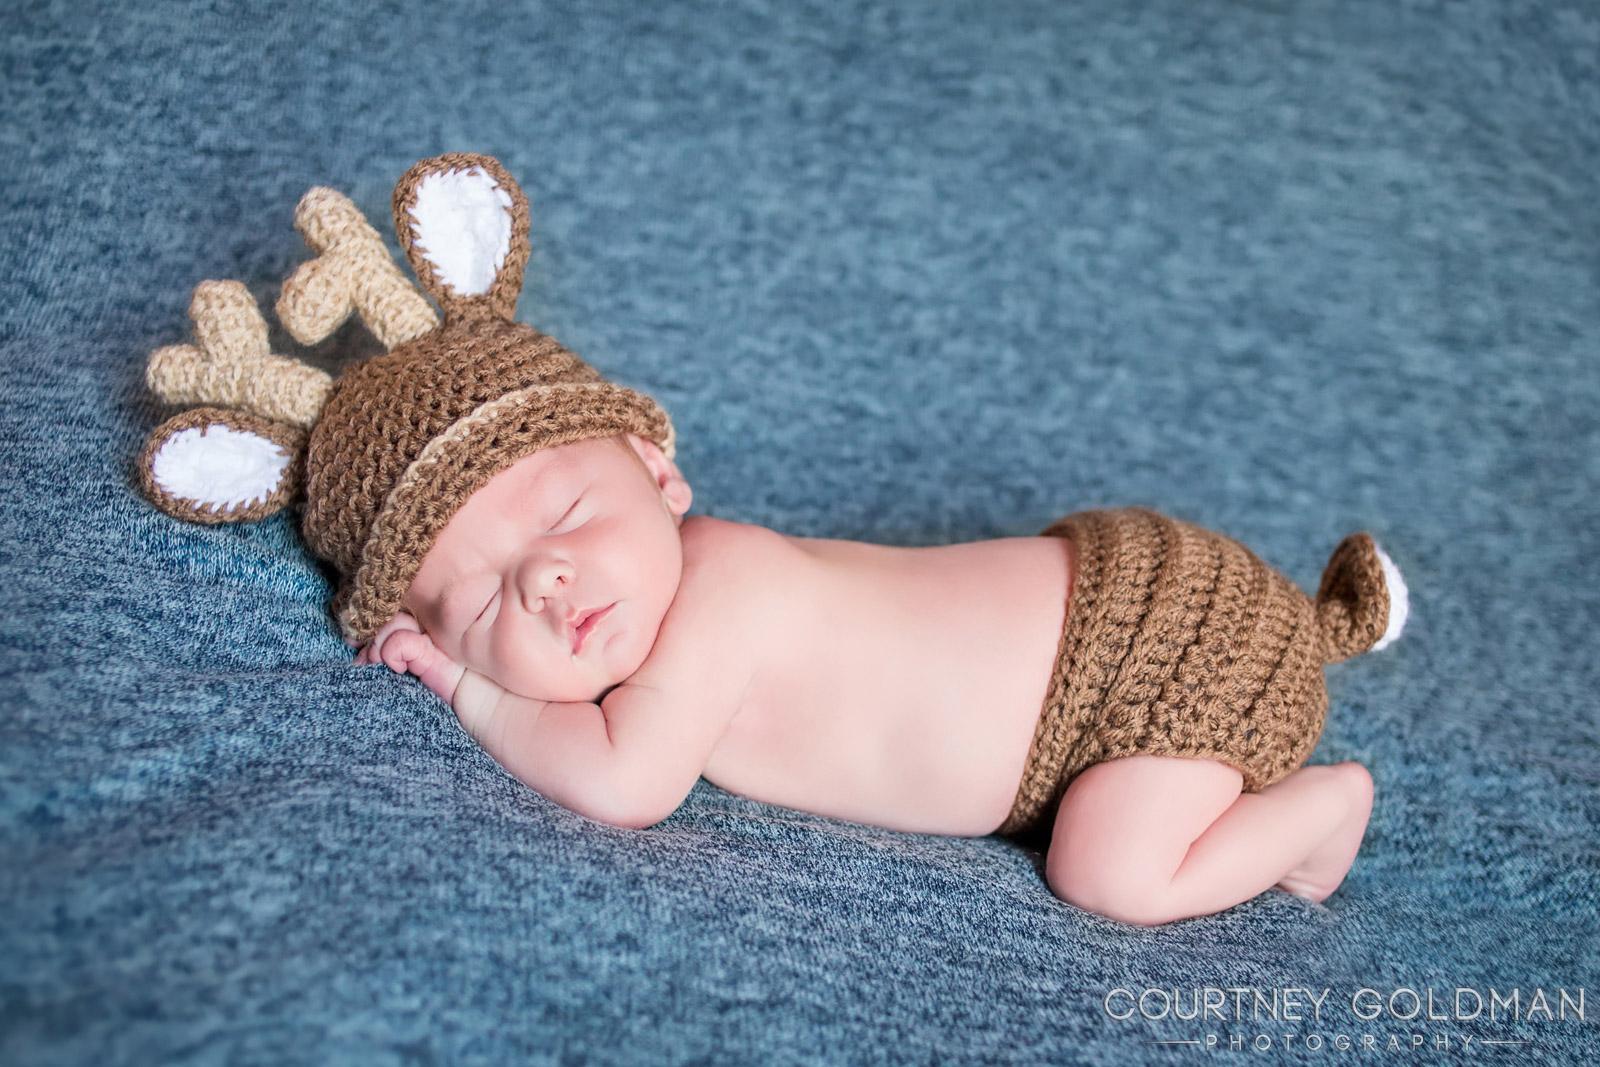 Atlanta Maternity and Newborn Photography by Courtney Goldman 21.jpg